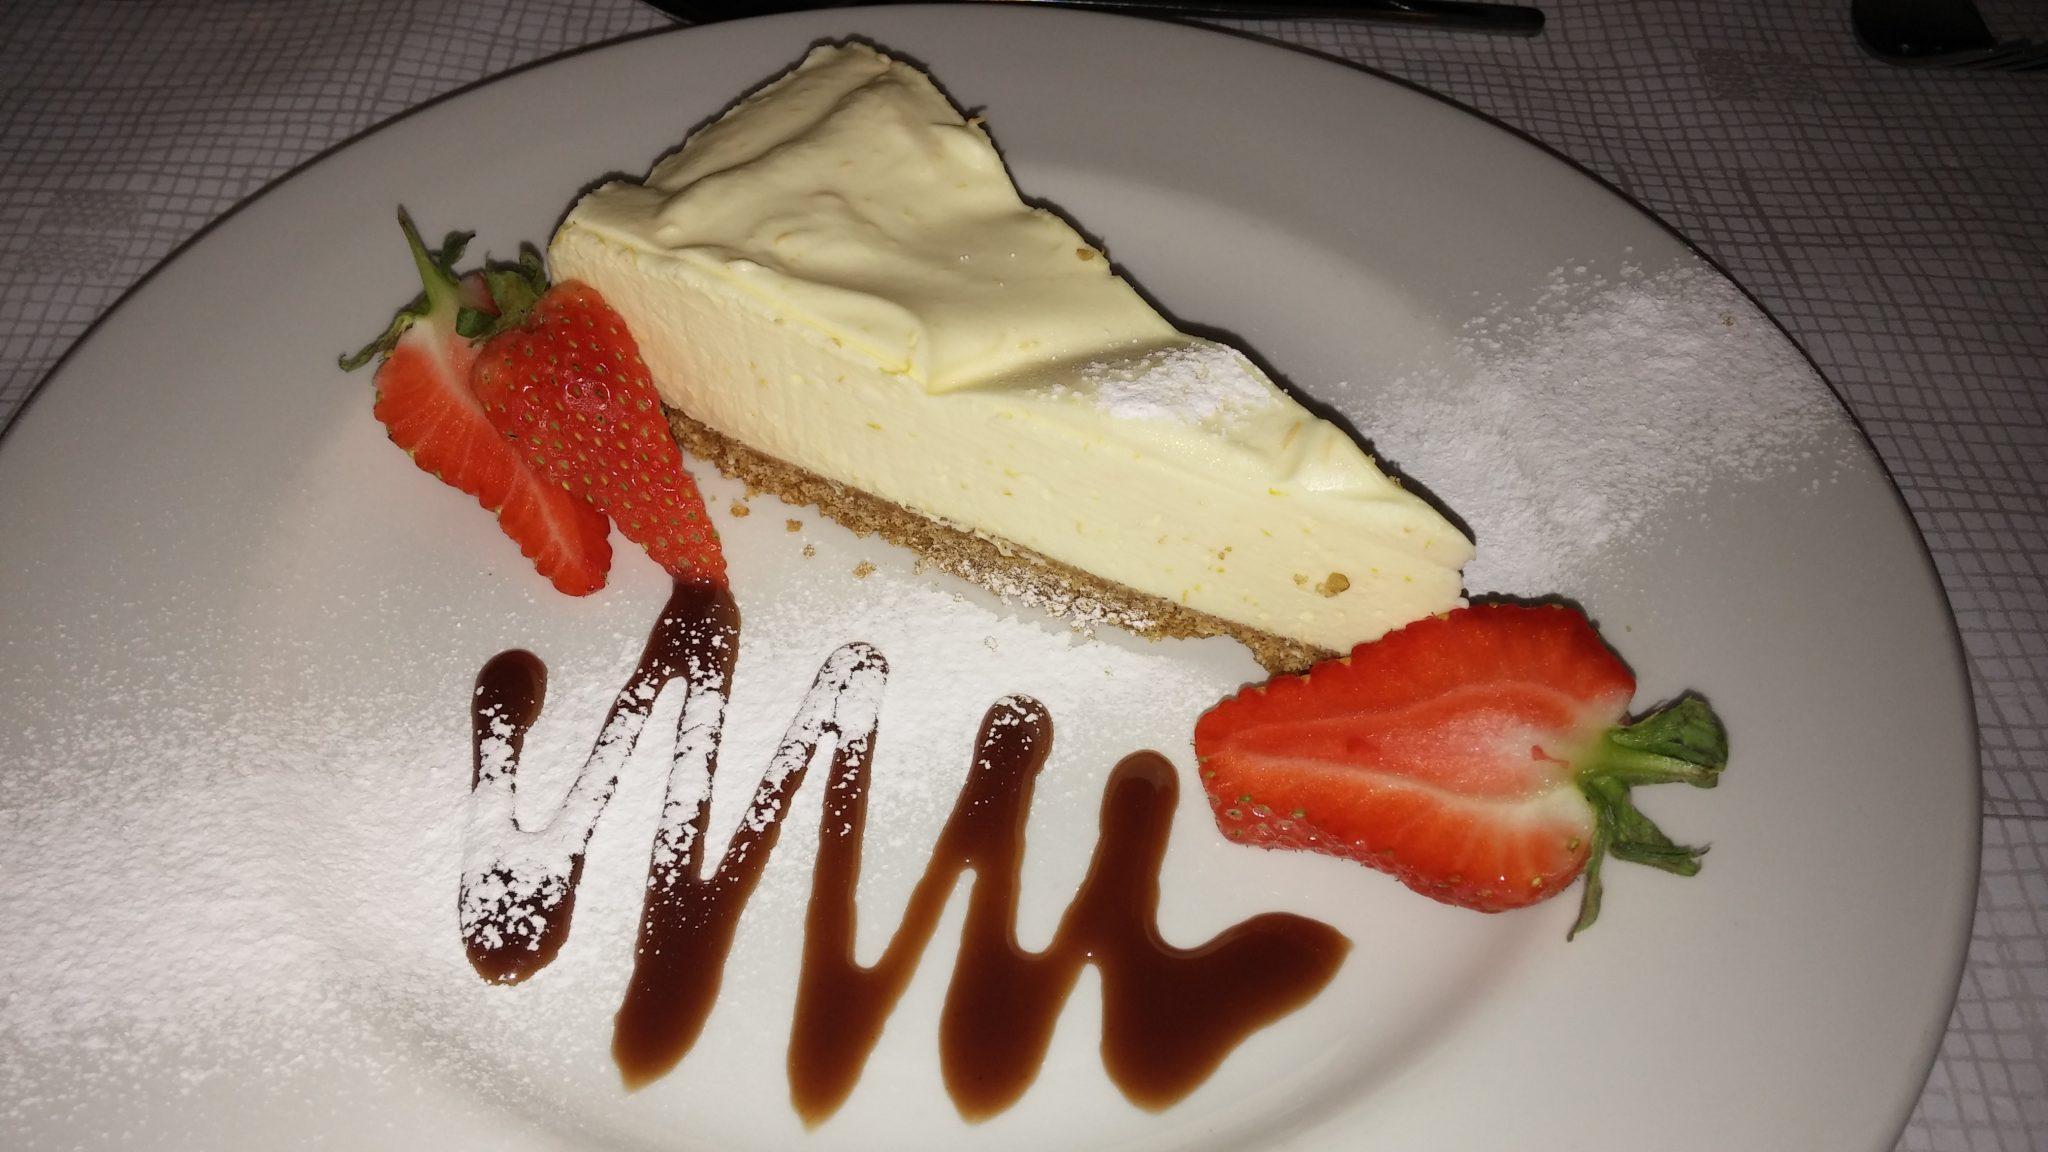 Orange home-made cheesecake & chocolate sauce